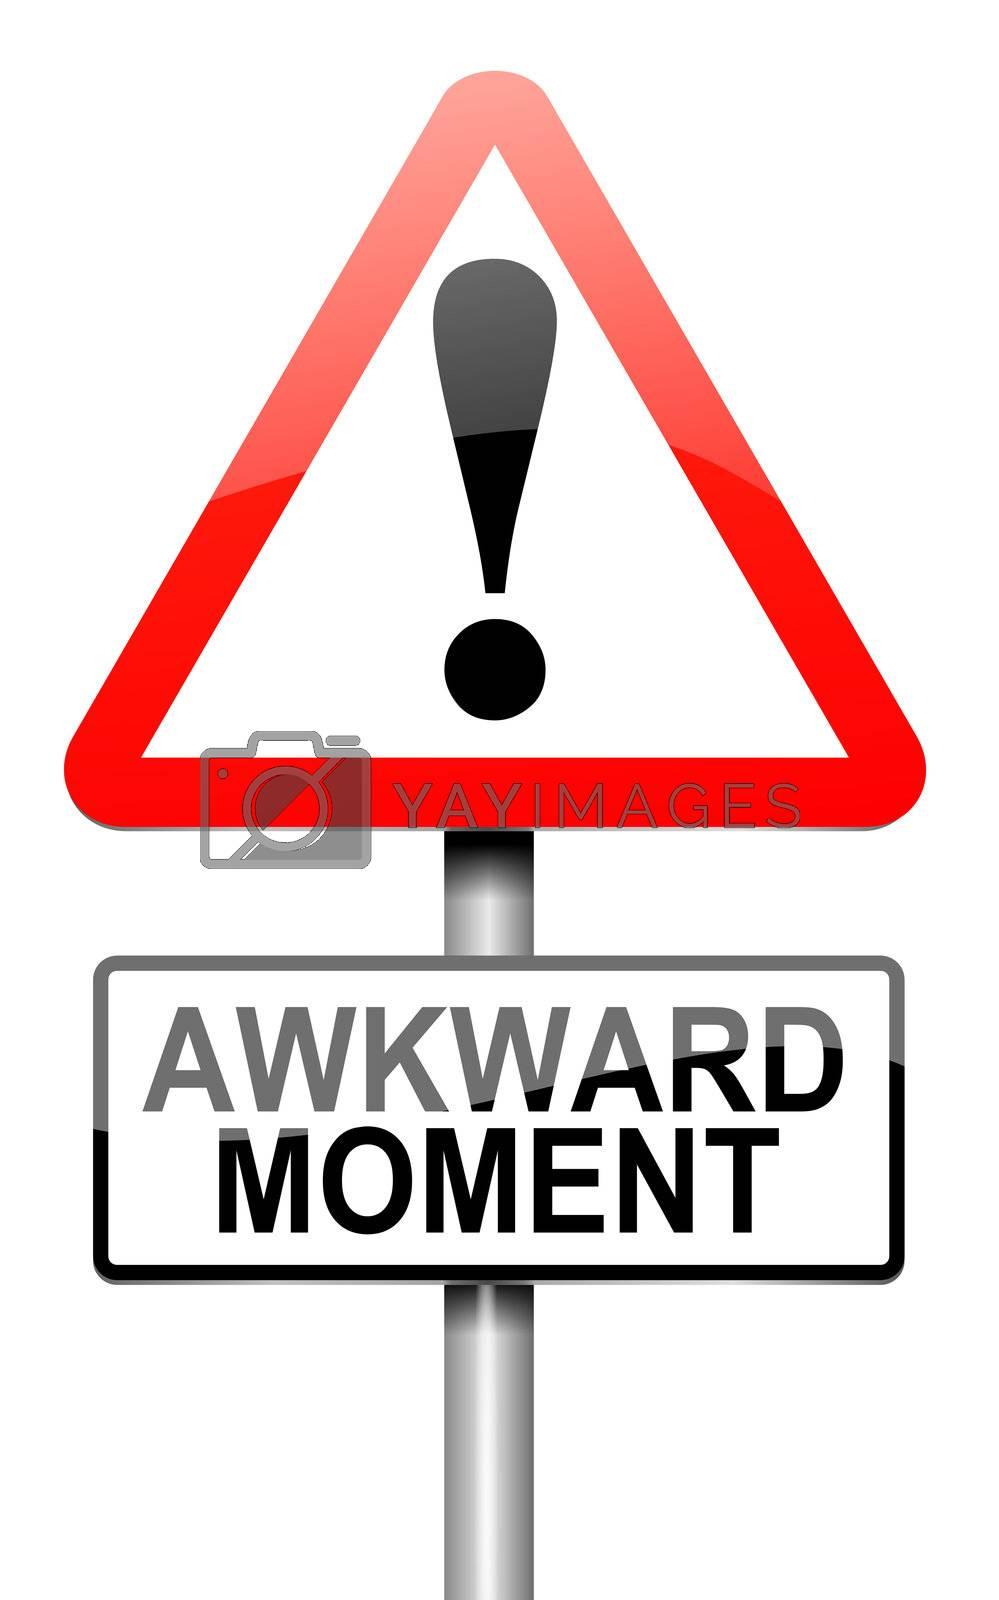 Awkward moment. by 72soul